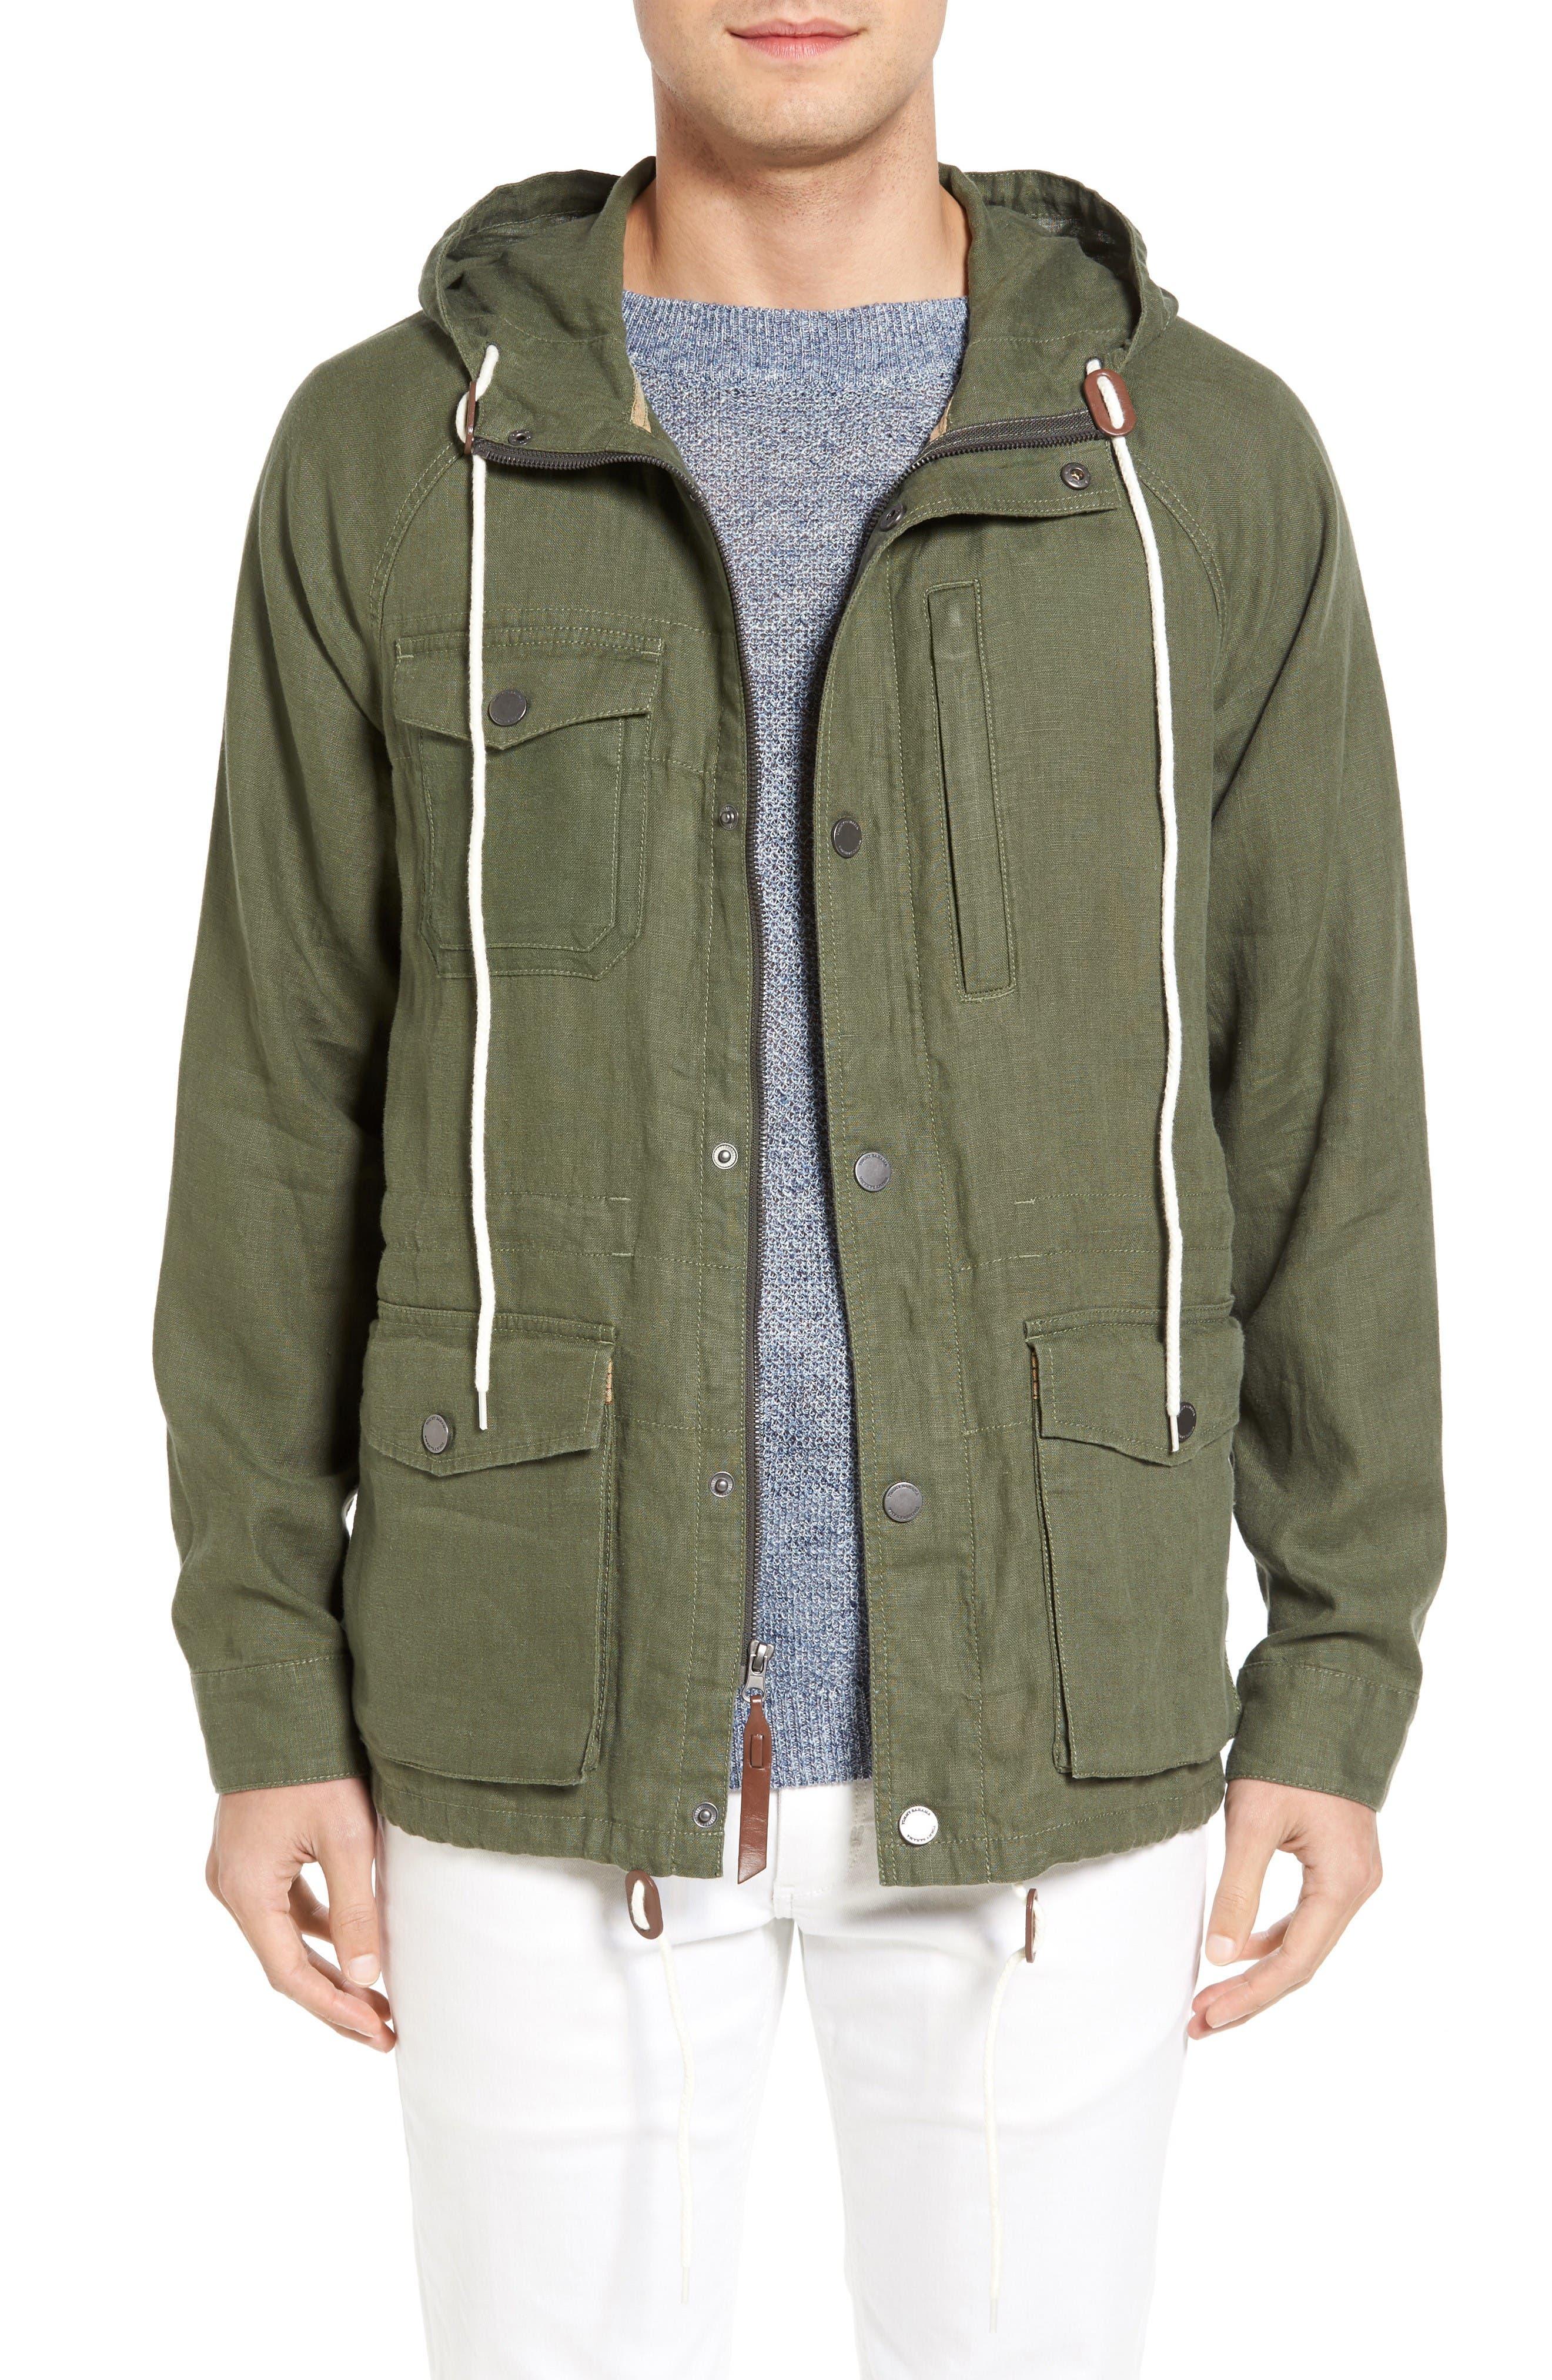 Alternate Image 1 Selected - Tommy Bahama Harbor Linen Hooded Jacket